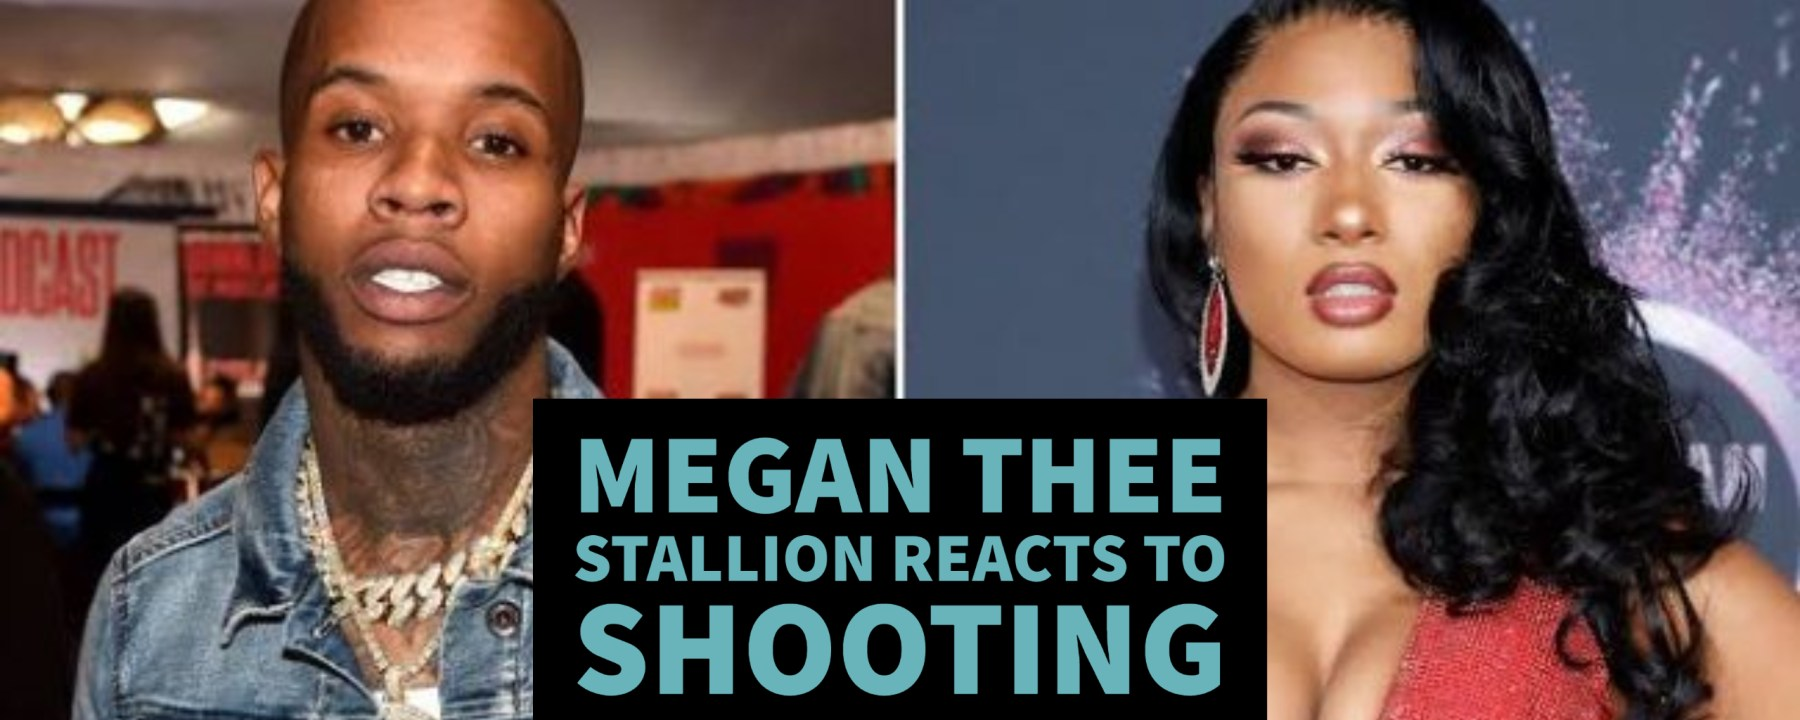 Megan Thee Stallion Reacts to Shooting